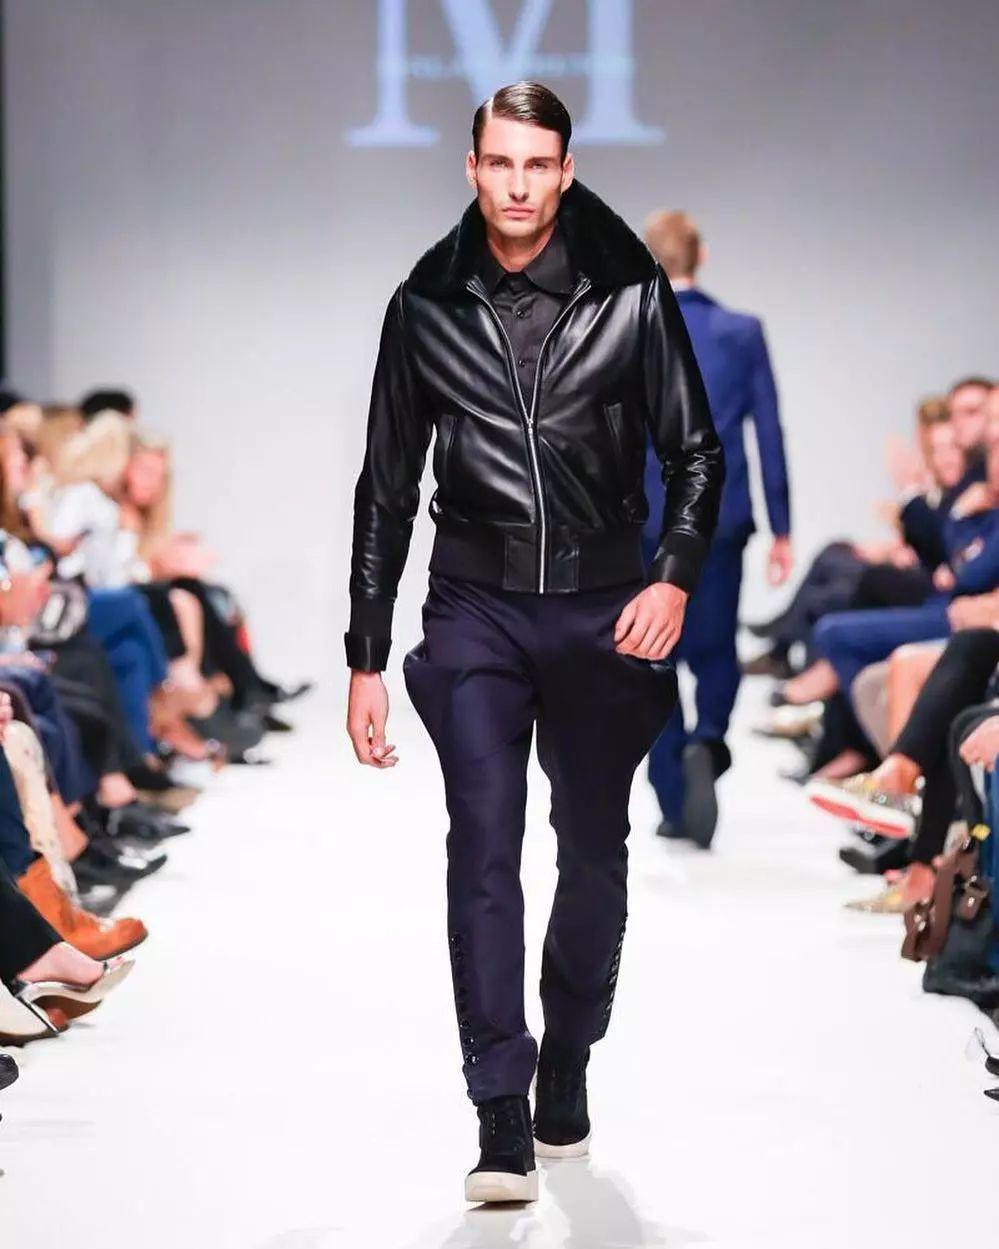 e8488c44e9454e6bac455055f37f3a1c - 来自奥地利的男模Christoph Leitner成为了时装周的热门